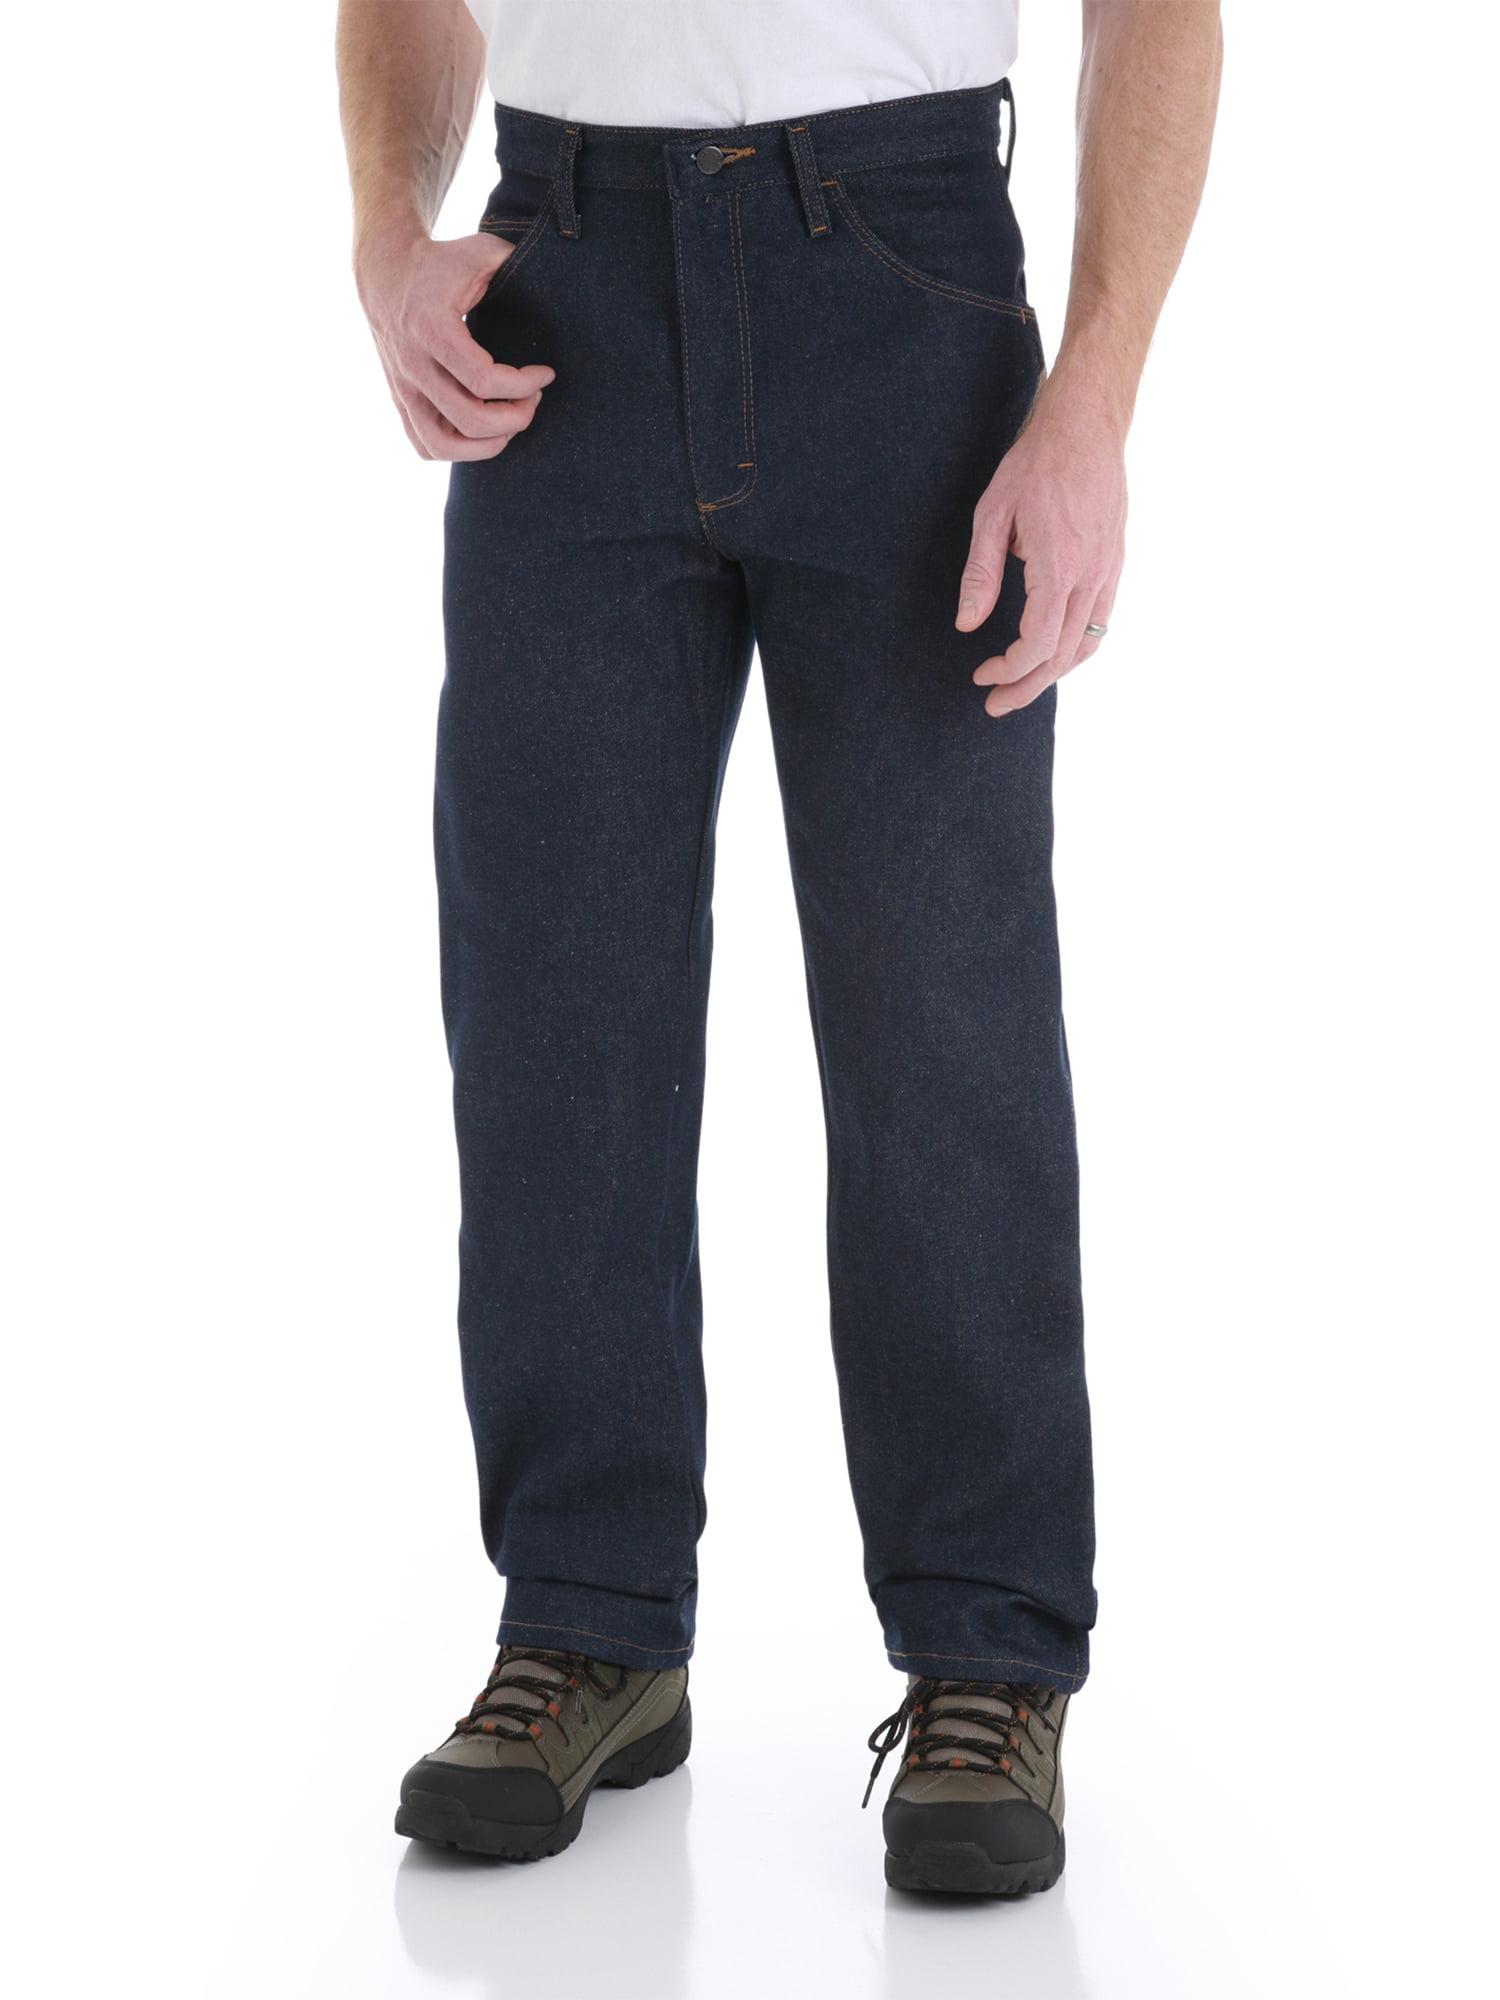 Rustler Rustler Men S Regular Fit Boot Cut Jeans Walmart Com Walmart Com 87652 rustler five pocket relaxed fit straight leg jean. rustler rustler men s regular fit boot cut jeans walmart com